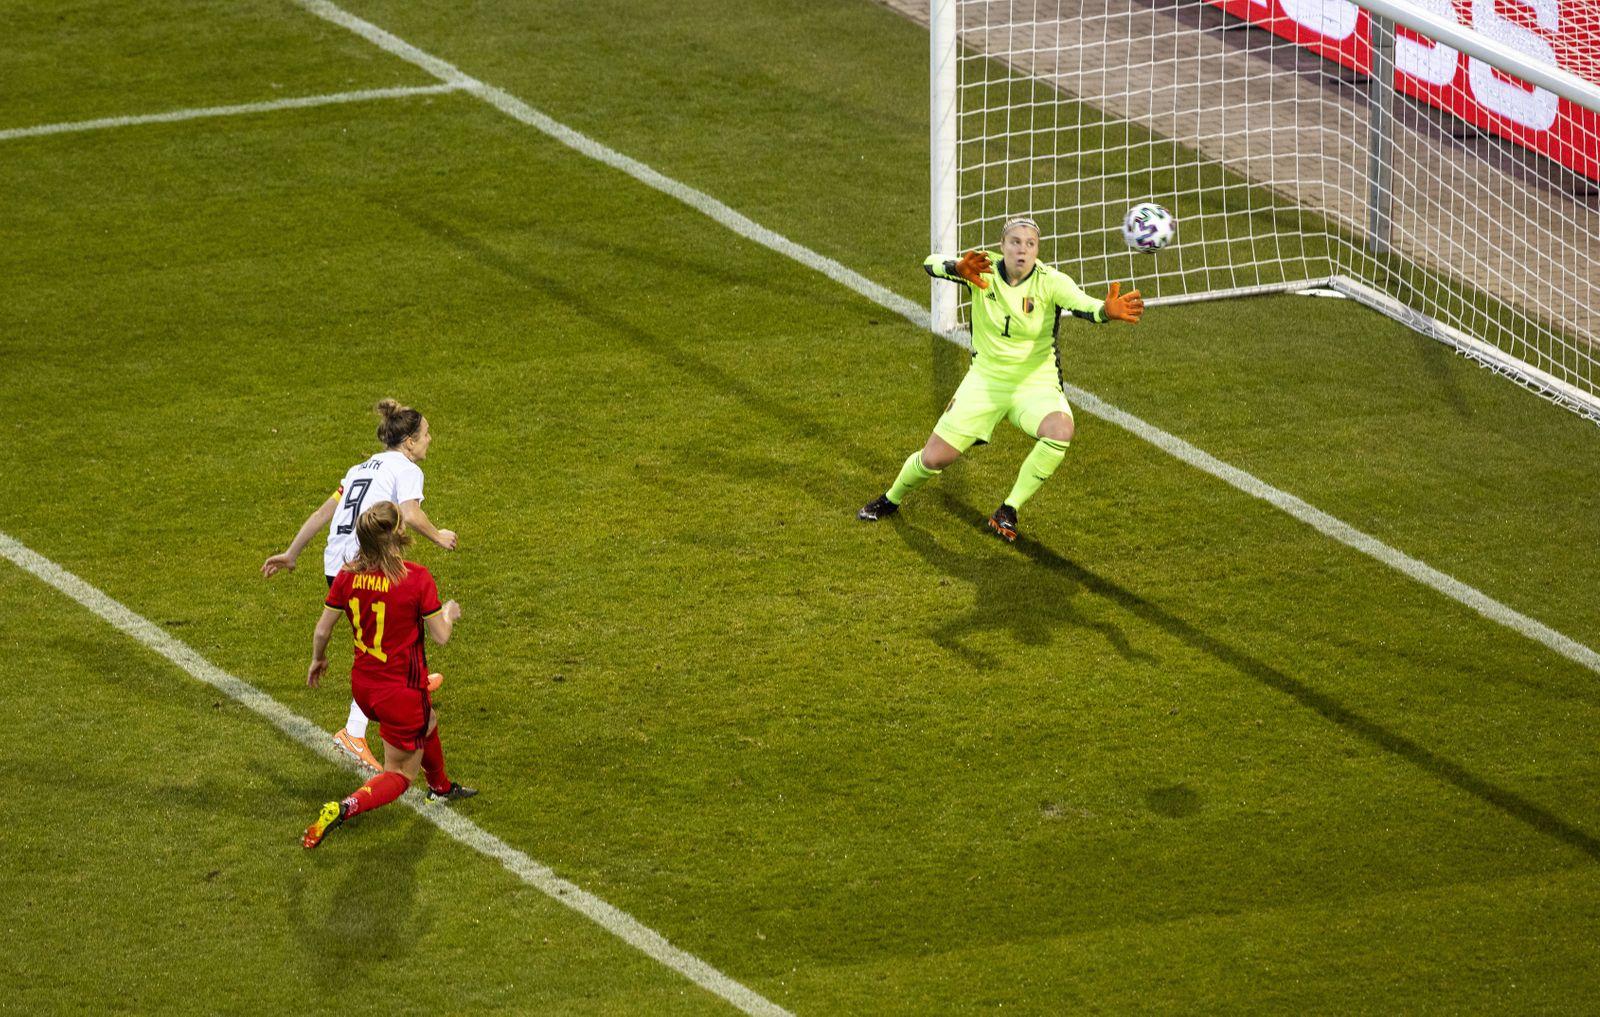 Tor zum 1:0 Svenja Huth (DFB) gegen TW Justin Odeurs (Belgien) Deutschland - Belgien Aachen, 21.02.2021, Damen, Fussbal